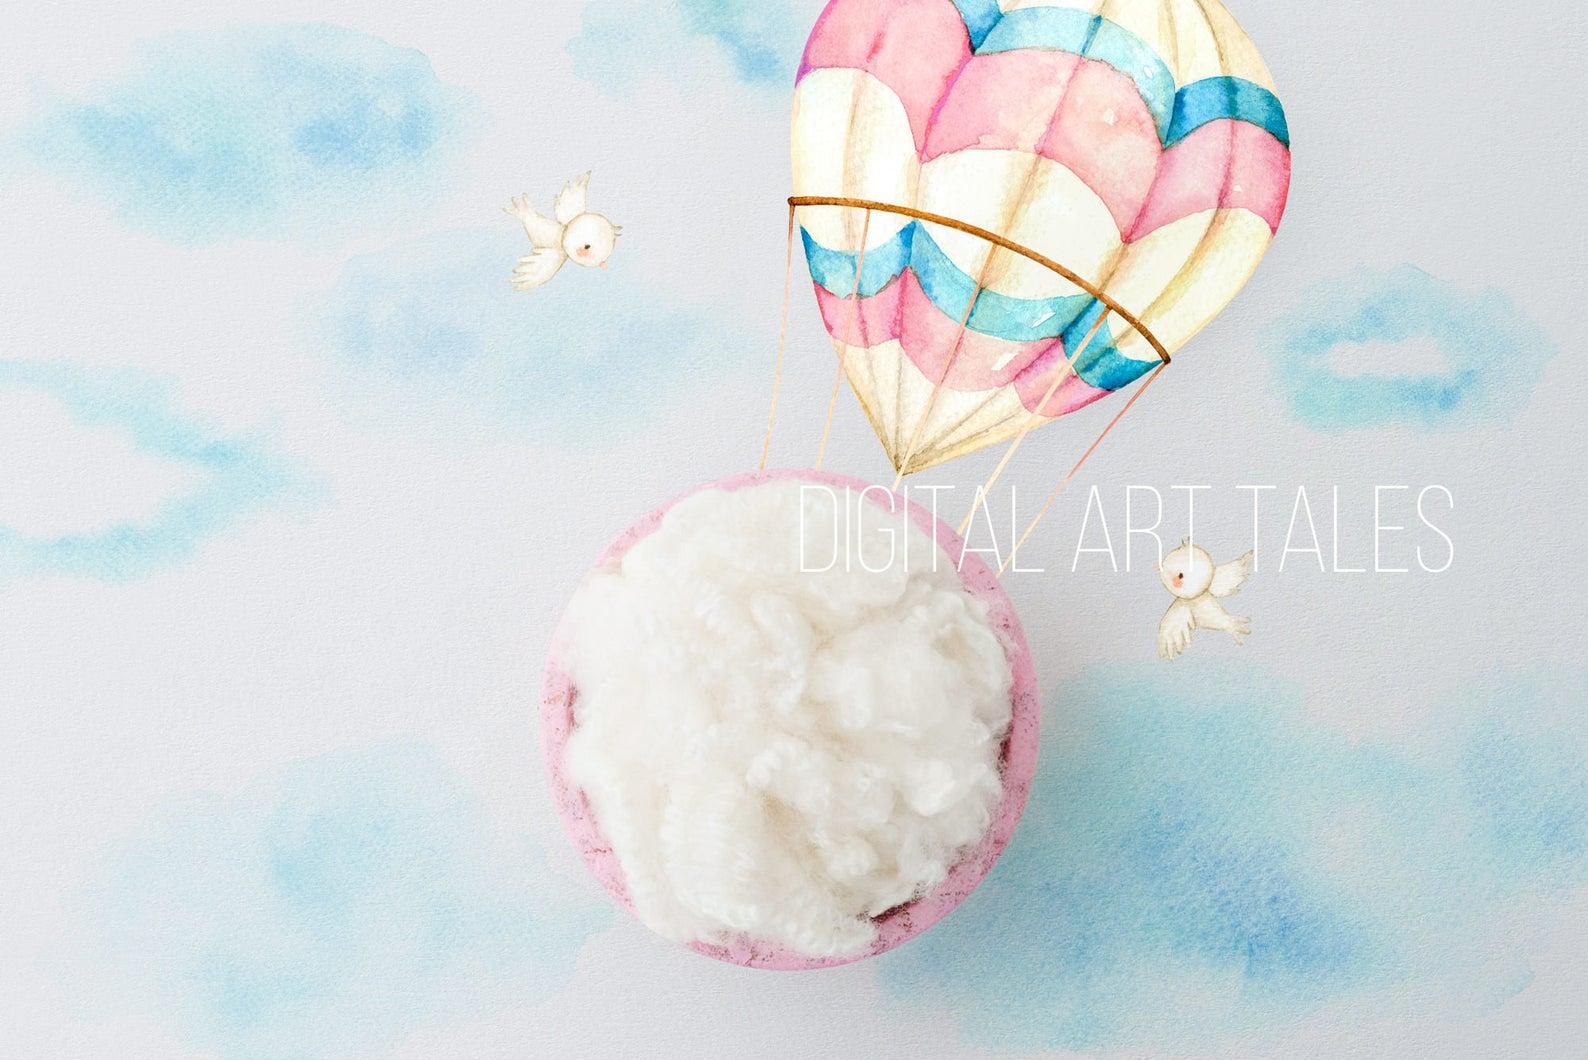 """Pink Balloon"" Digital Backdrop"